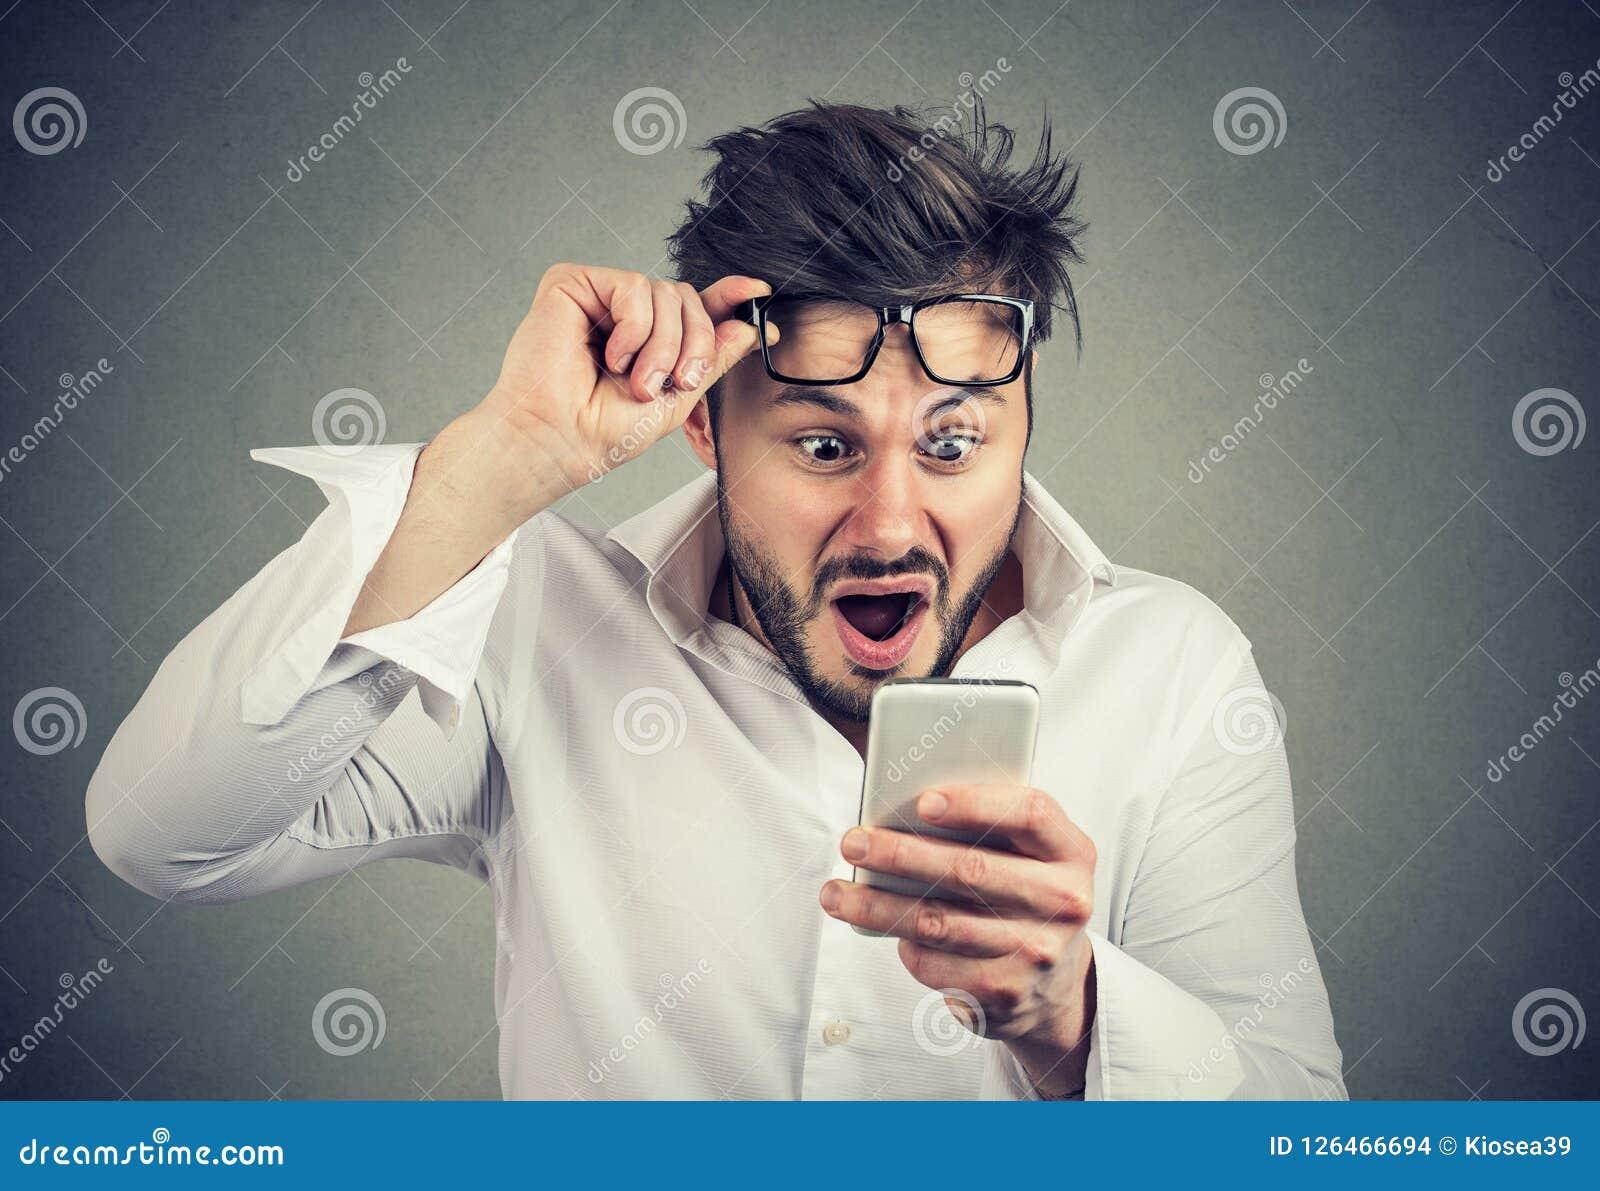 Shocked man reading news on smartphone